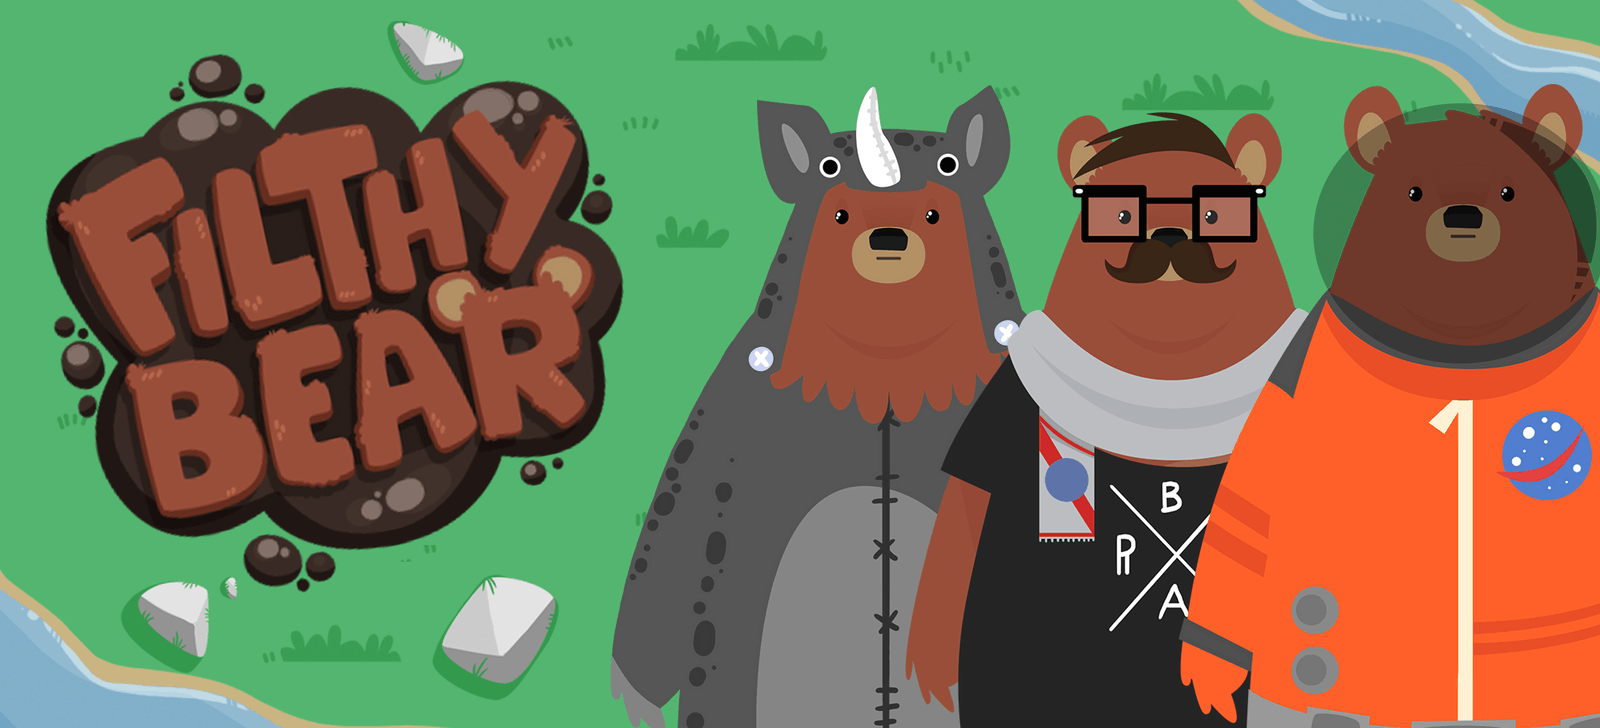 Filthy Bear